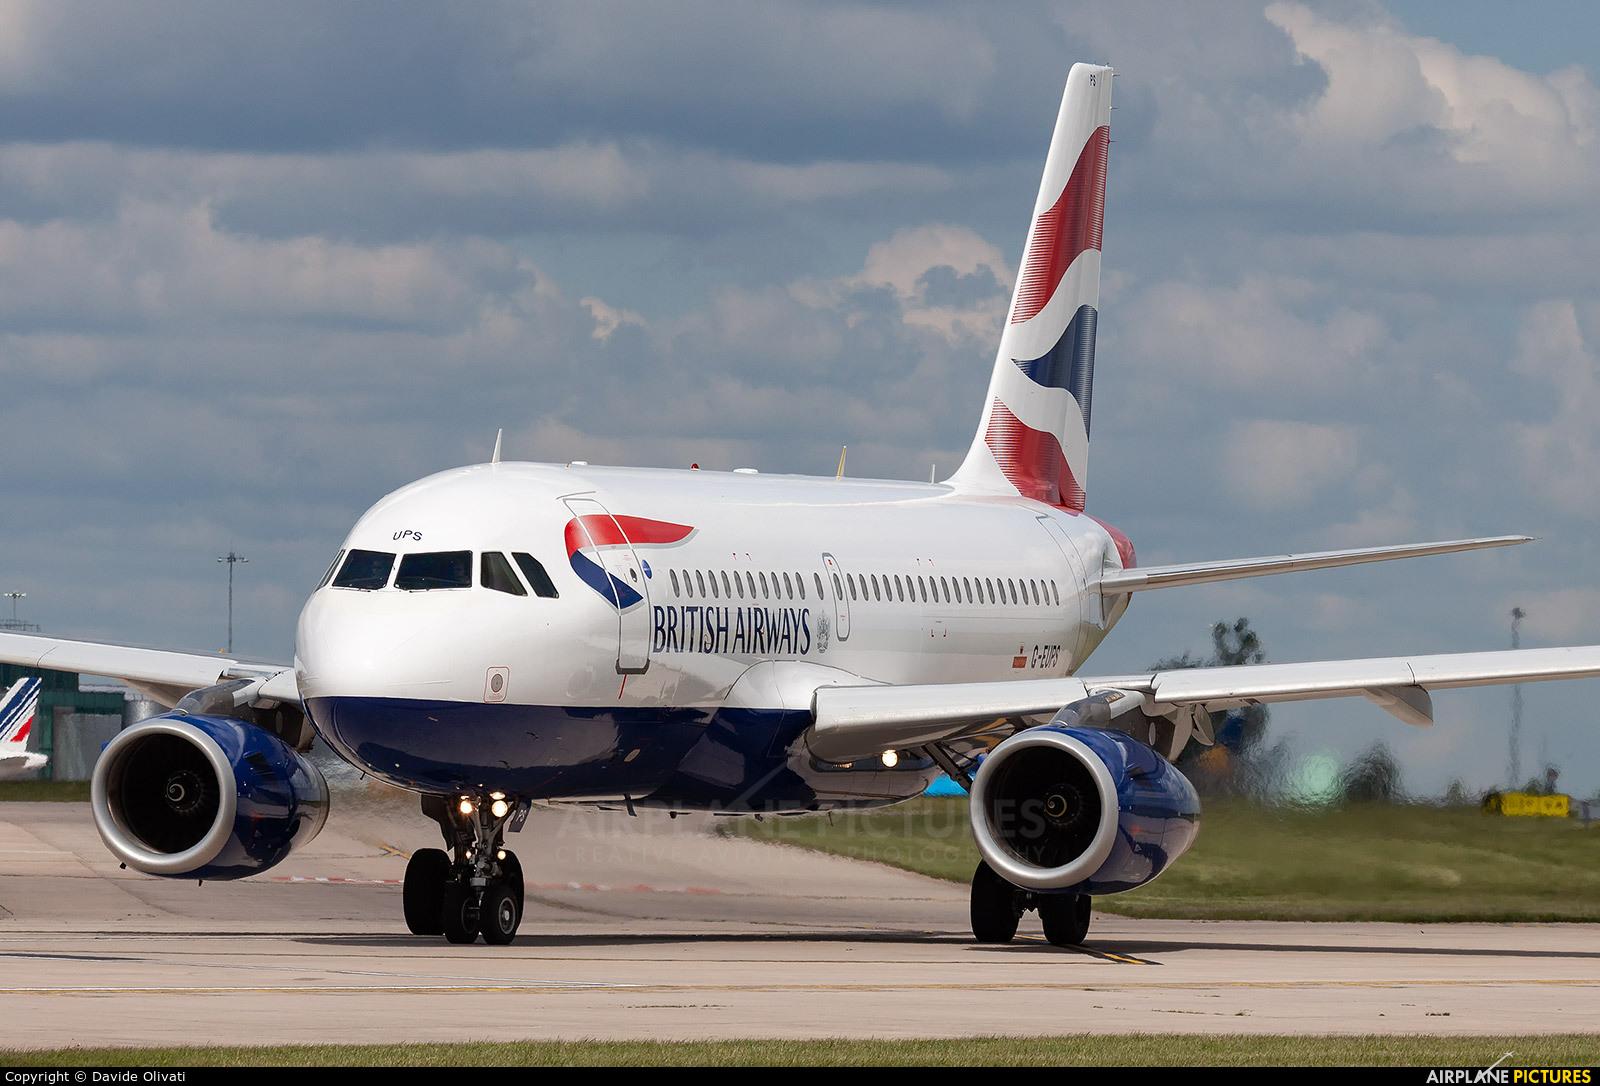 British Airways G-EUPS aircraft at Manchester